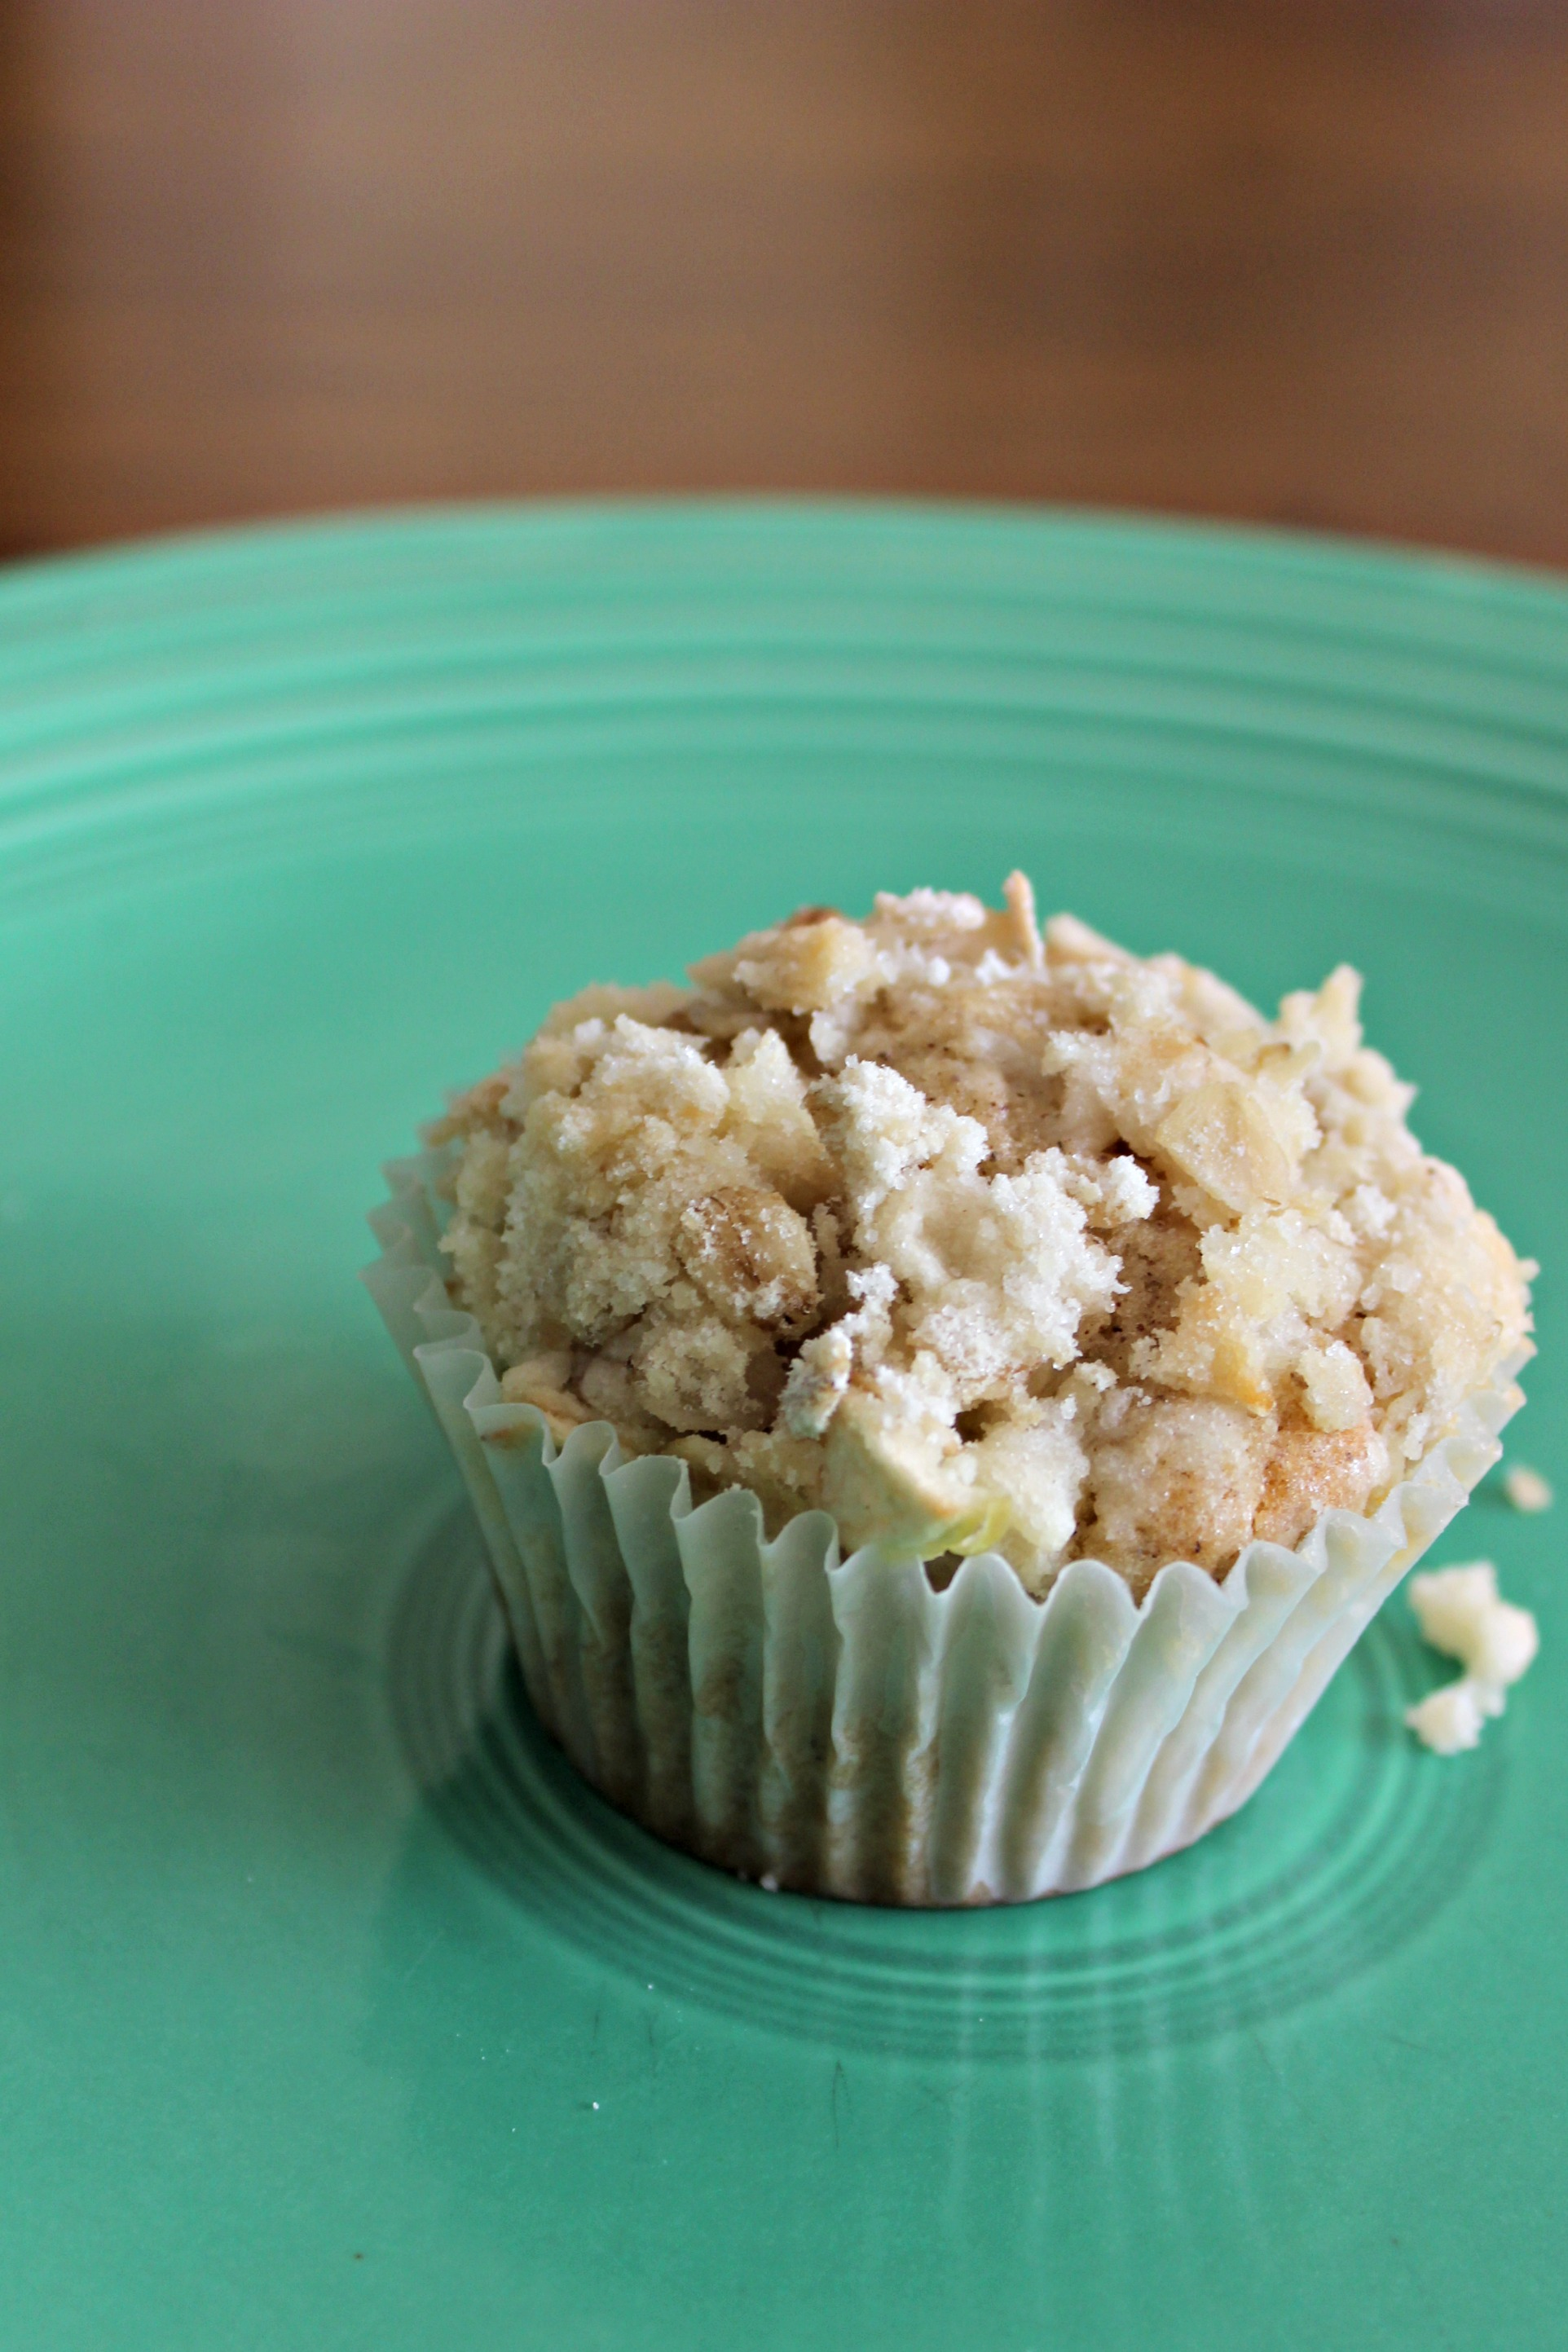 St. Patrick's Day Treat: Irish Apple Cupcakes